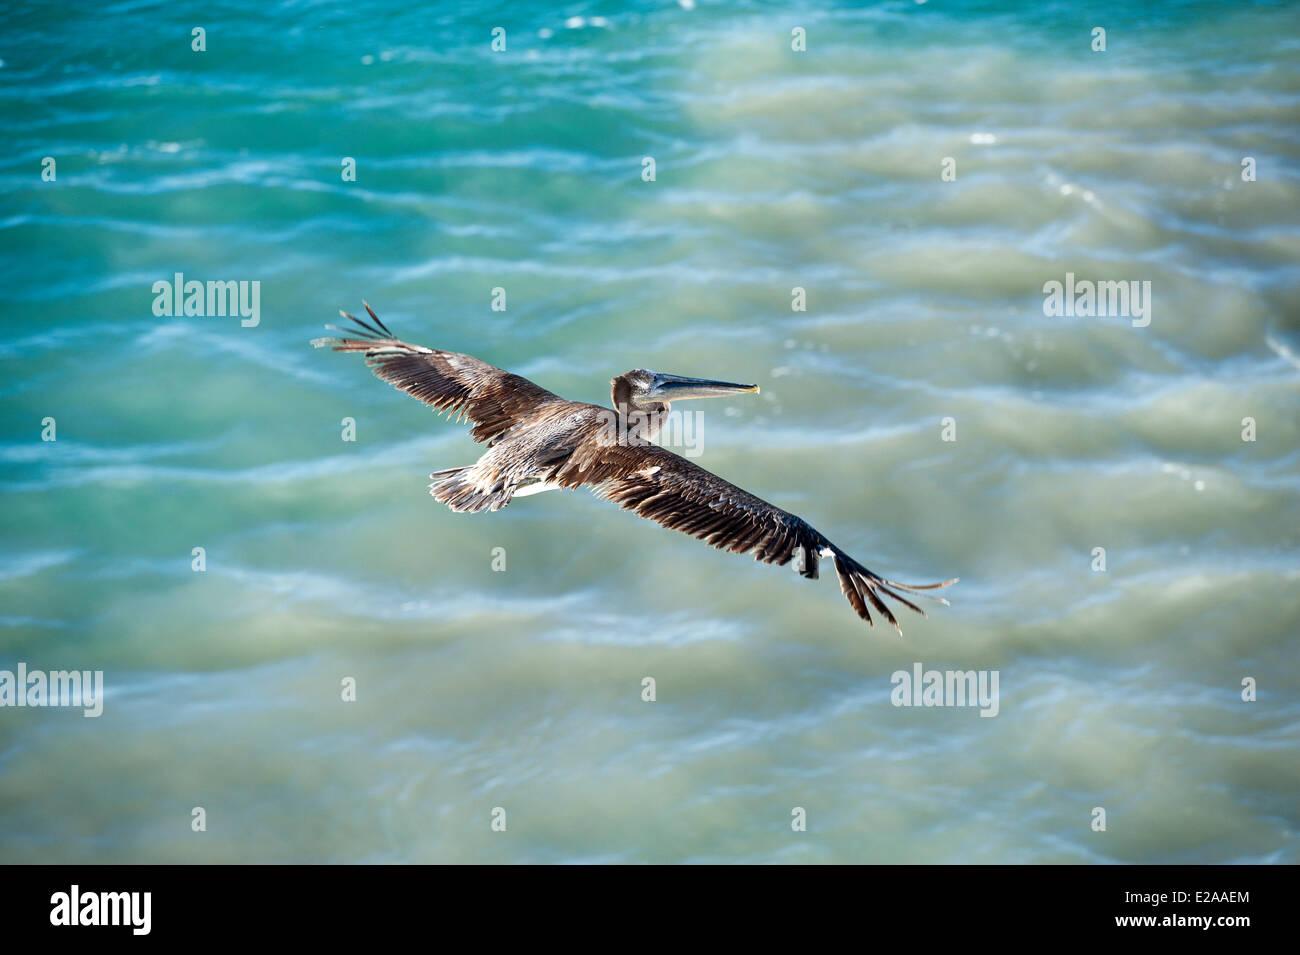 México, Estado de Baja California Sur, Pelican Imagen De Stock